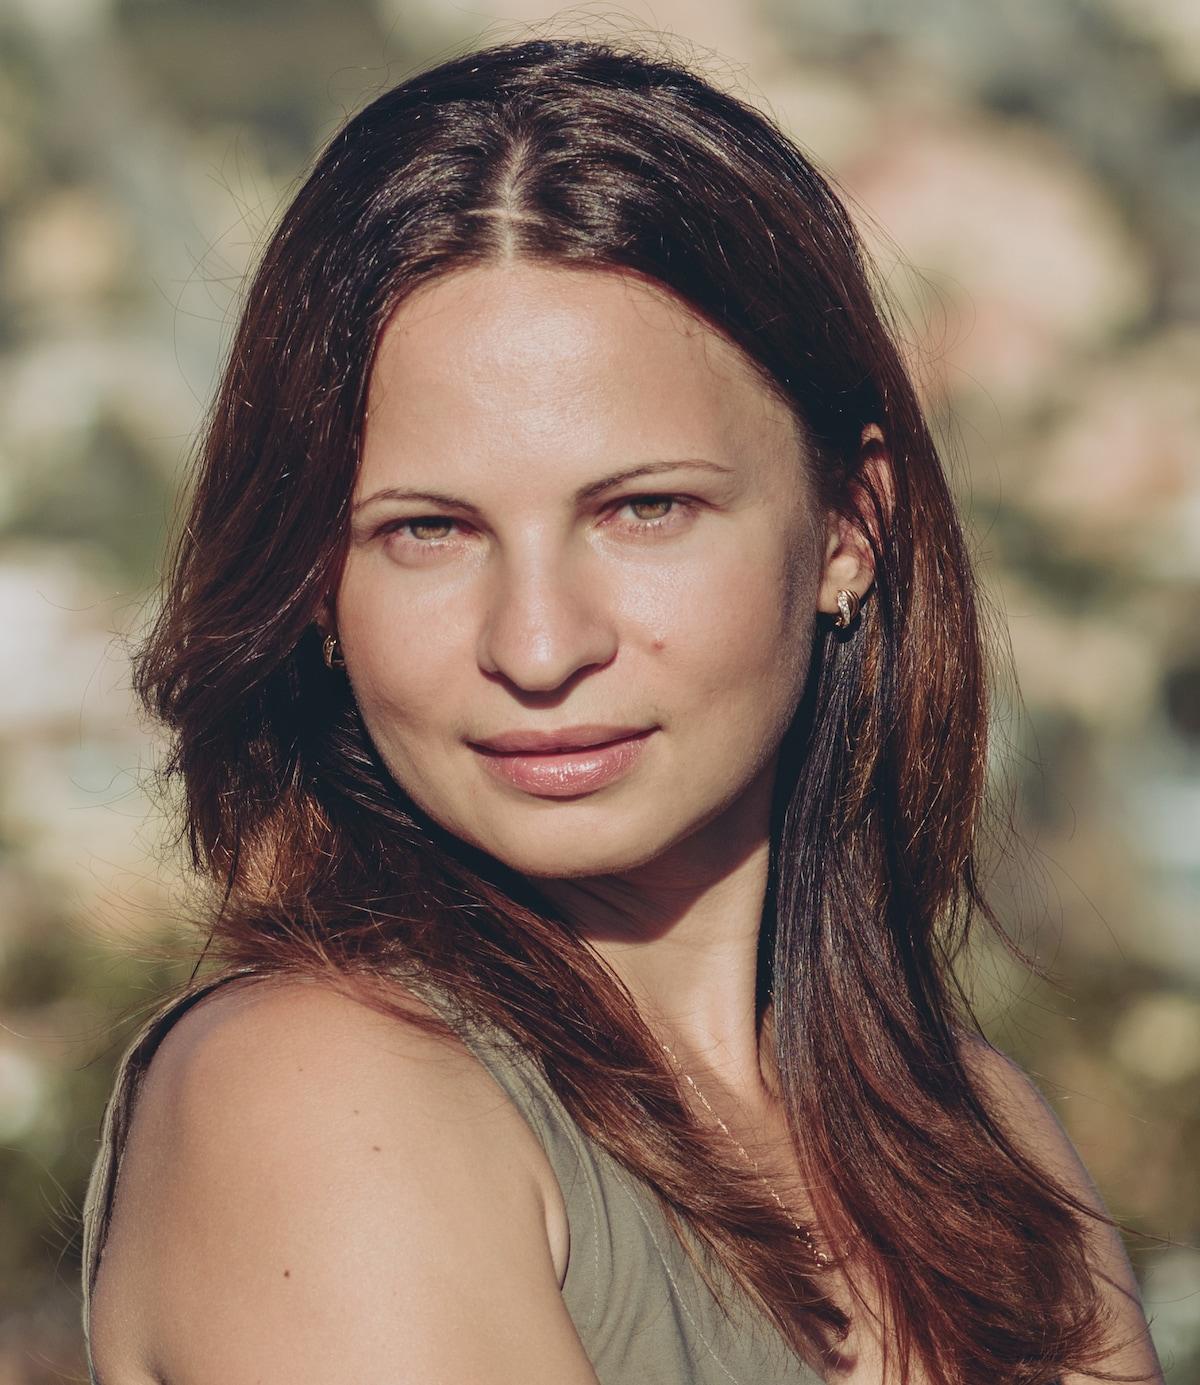 Olga From Benidorm, Spain